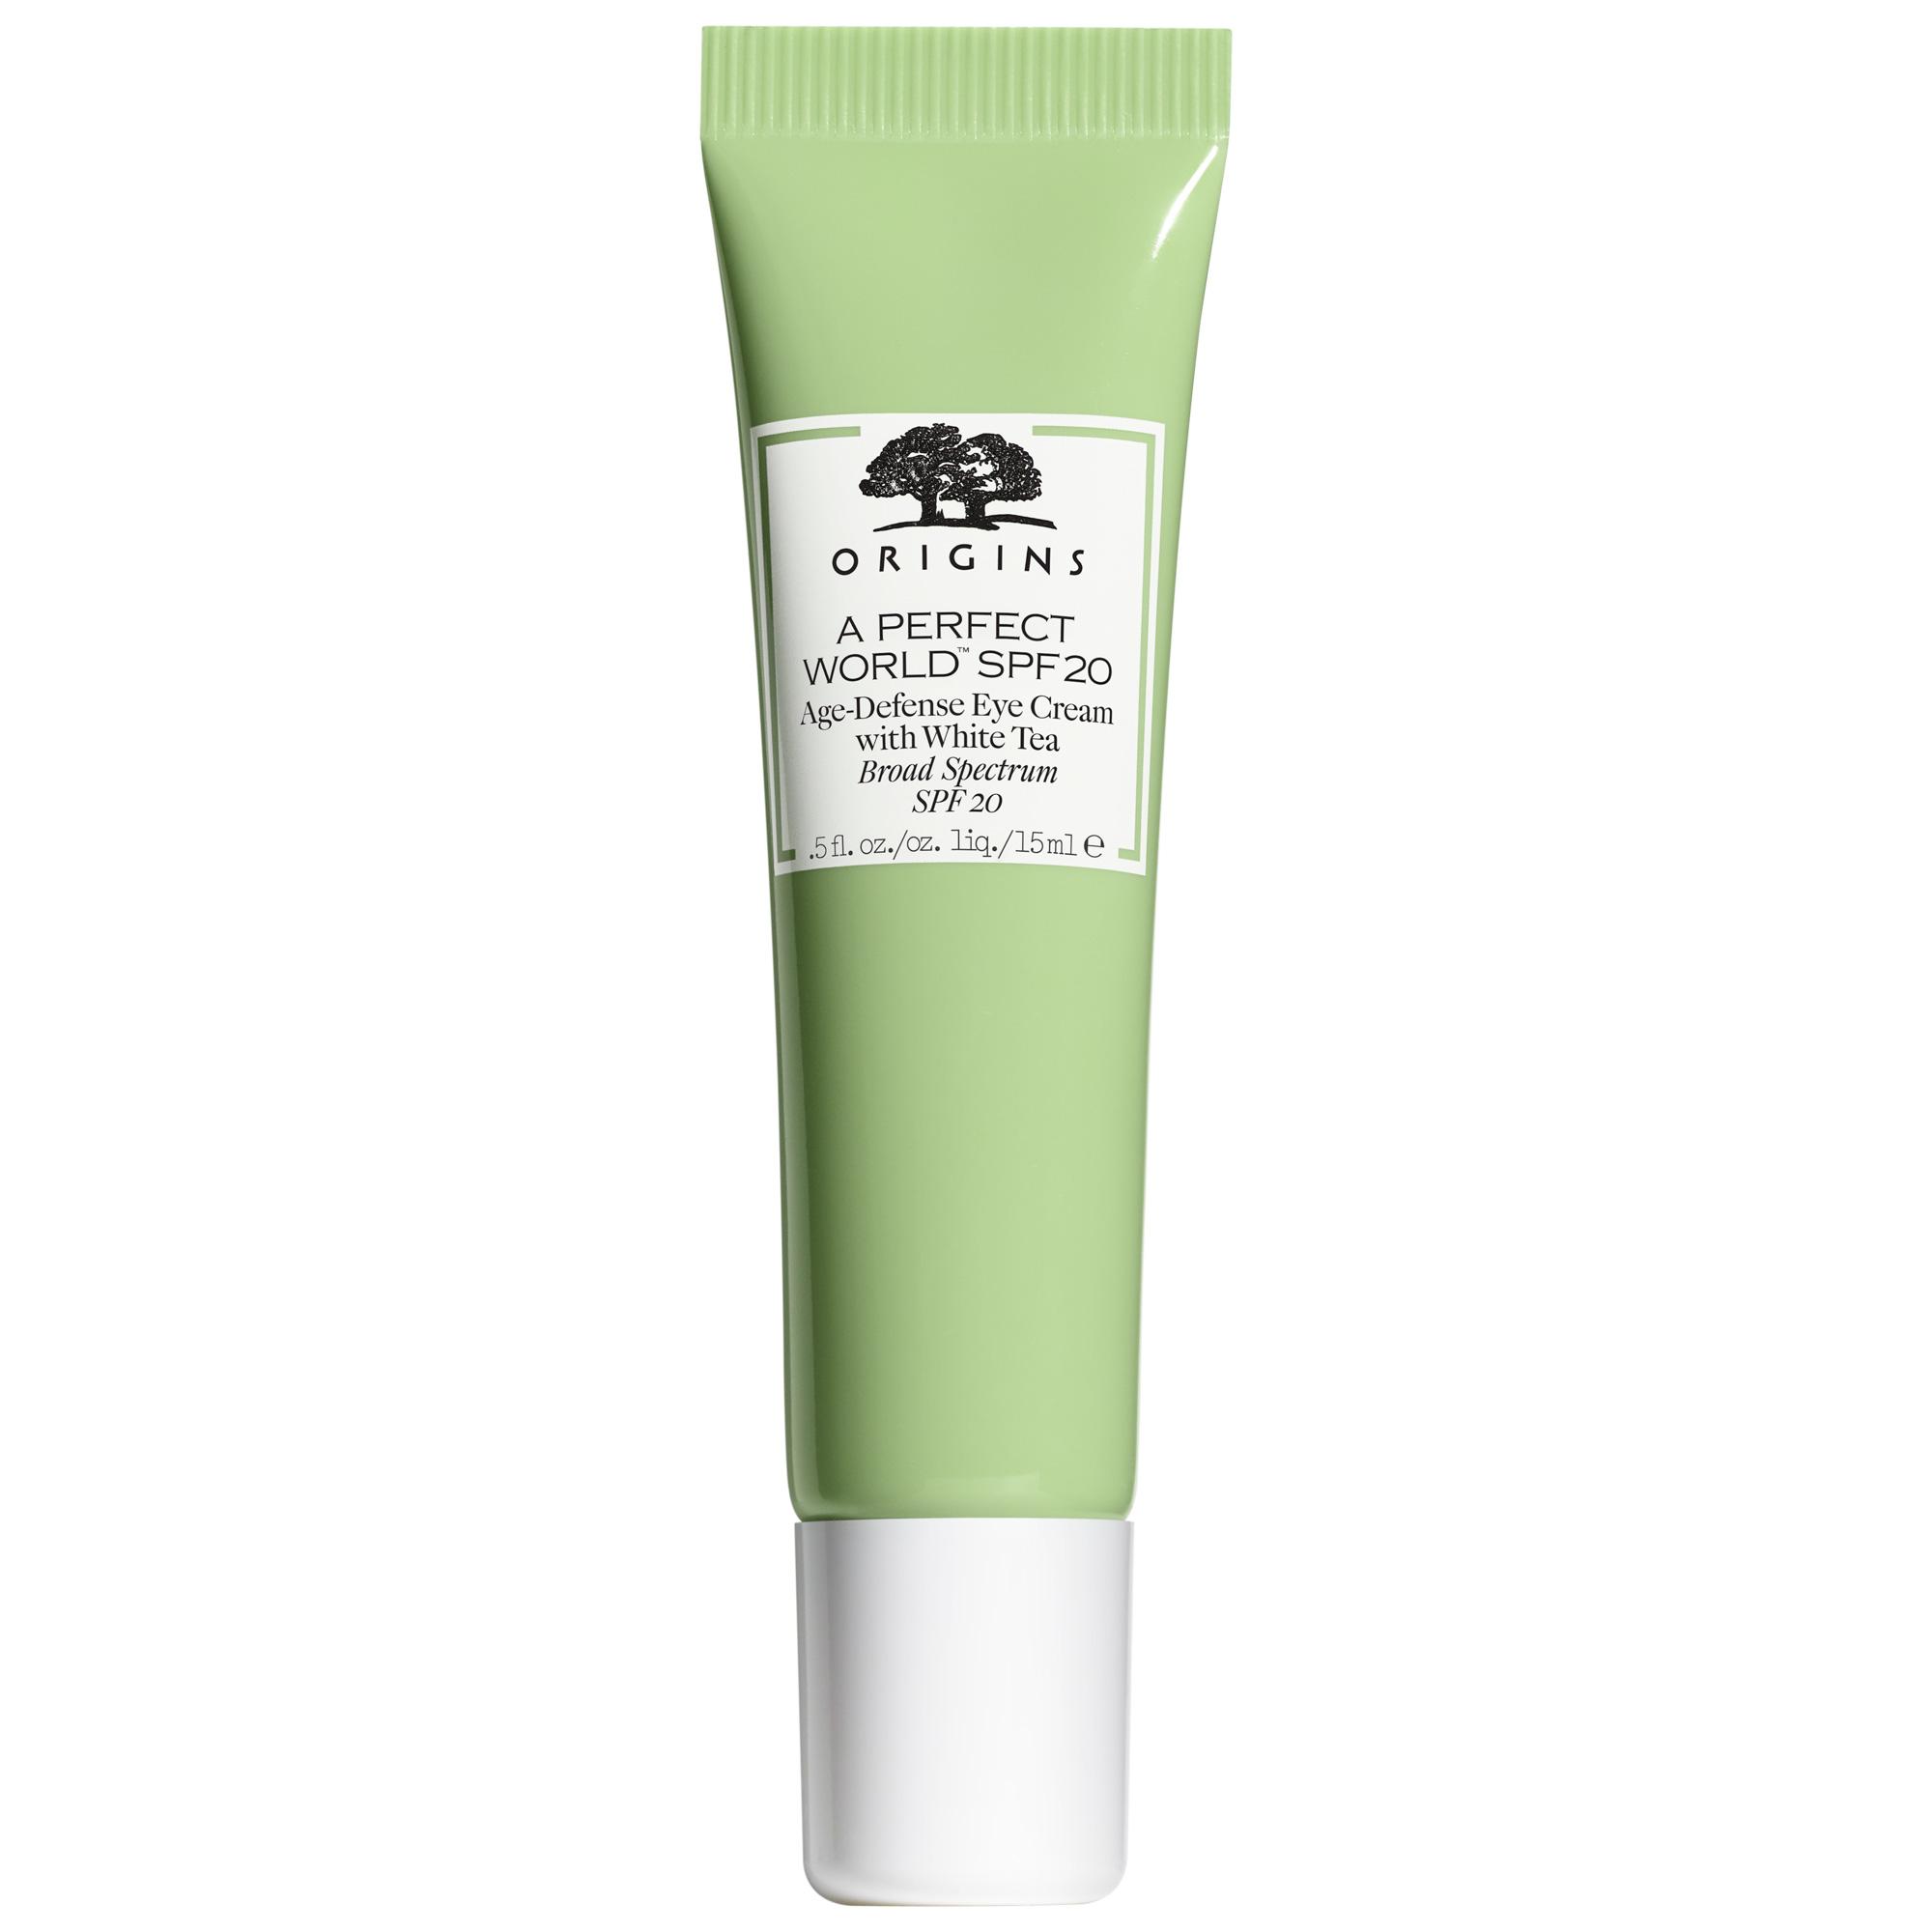 A Perfect World™ SPF 20 Age-Defense Eye Cream with White Tea 15ml